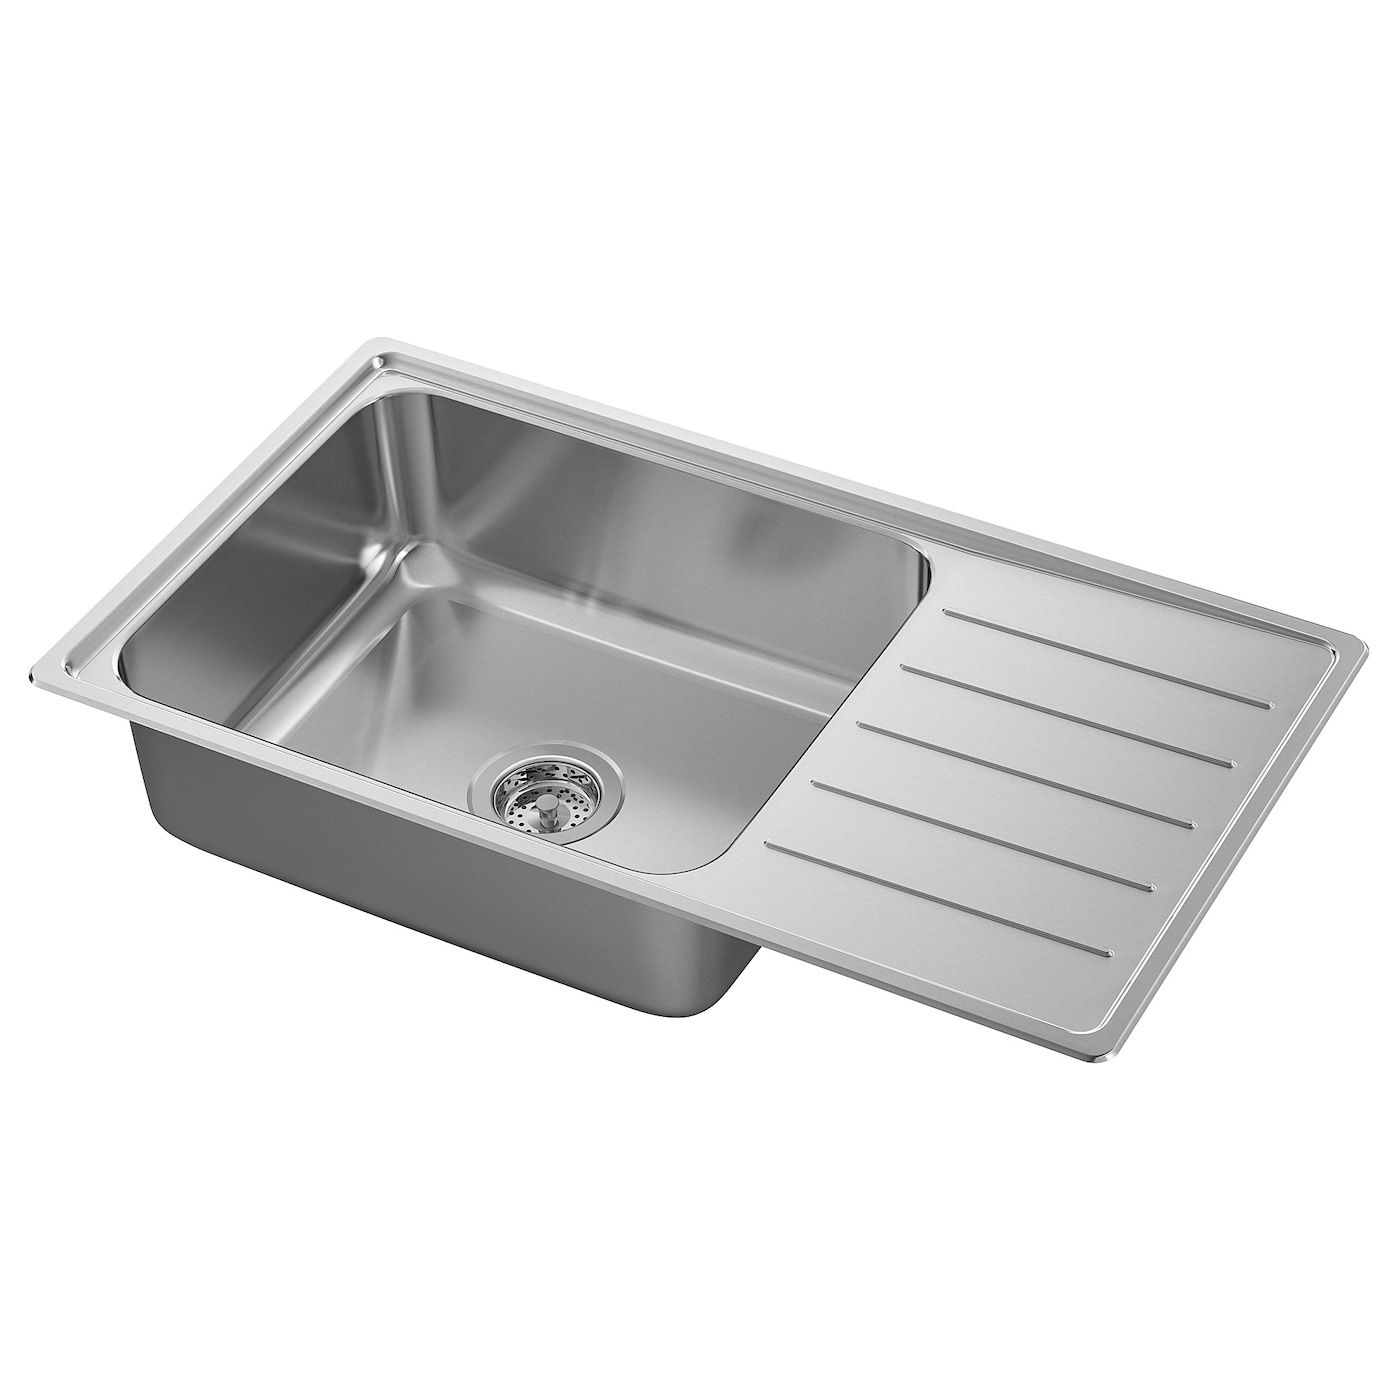 Vattudalen Stainless Steel Inset Sink 1 Bowl With Drainboard Bowl Width 50 Cm Ikea In 2020 Einbauspule Edelstahl Edelstahlspule